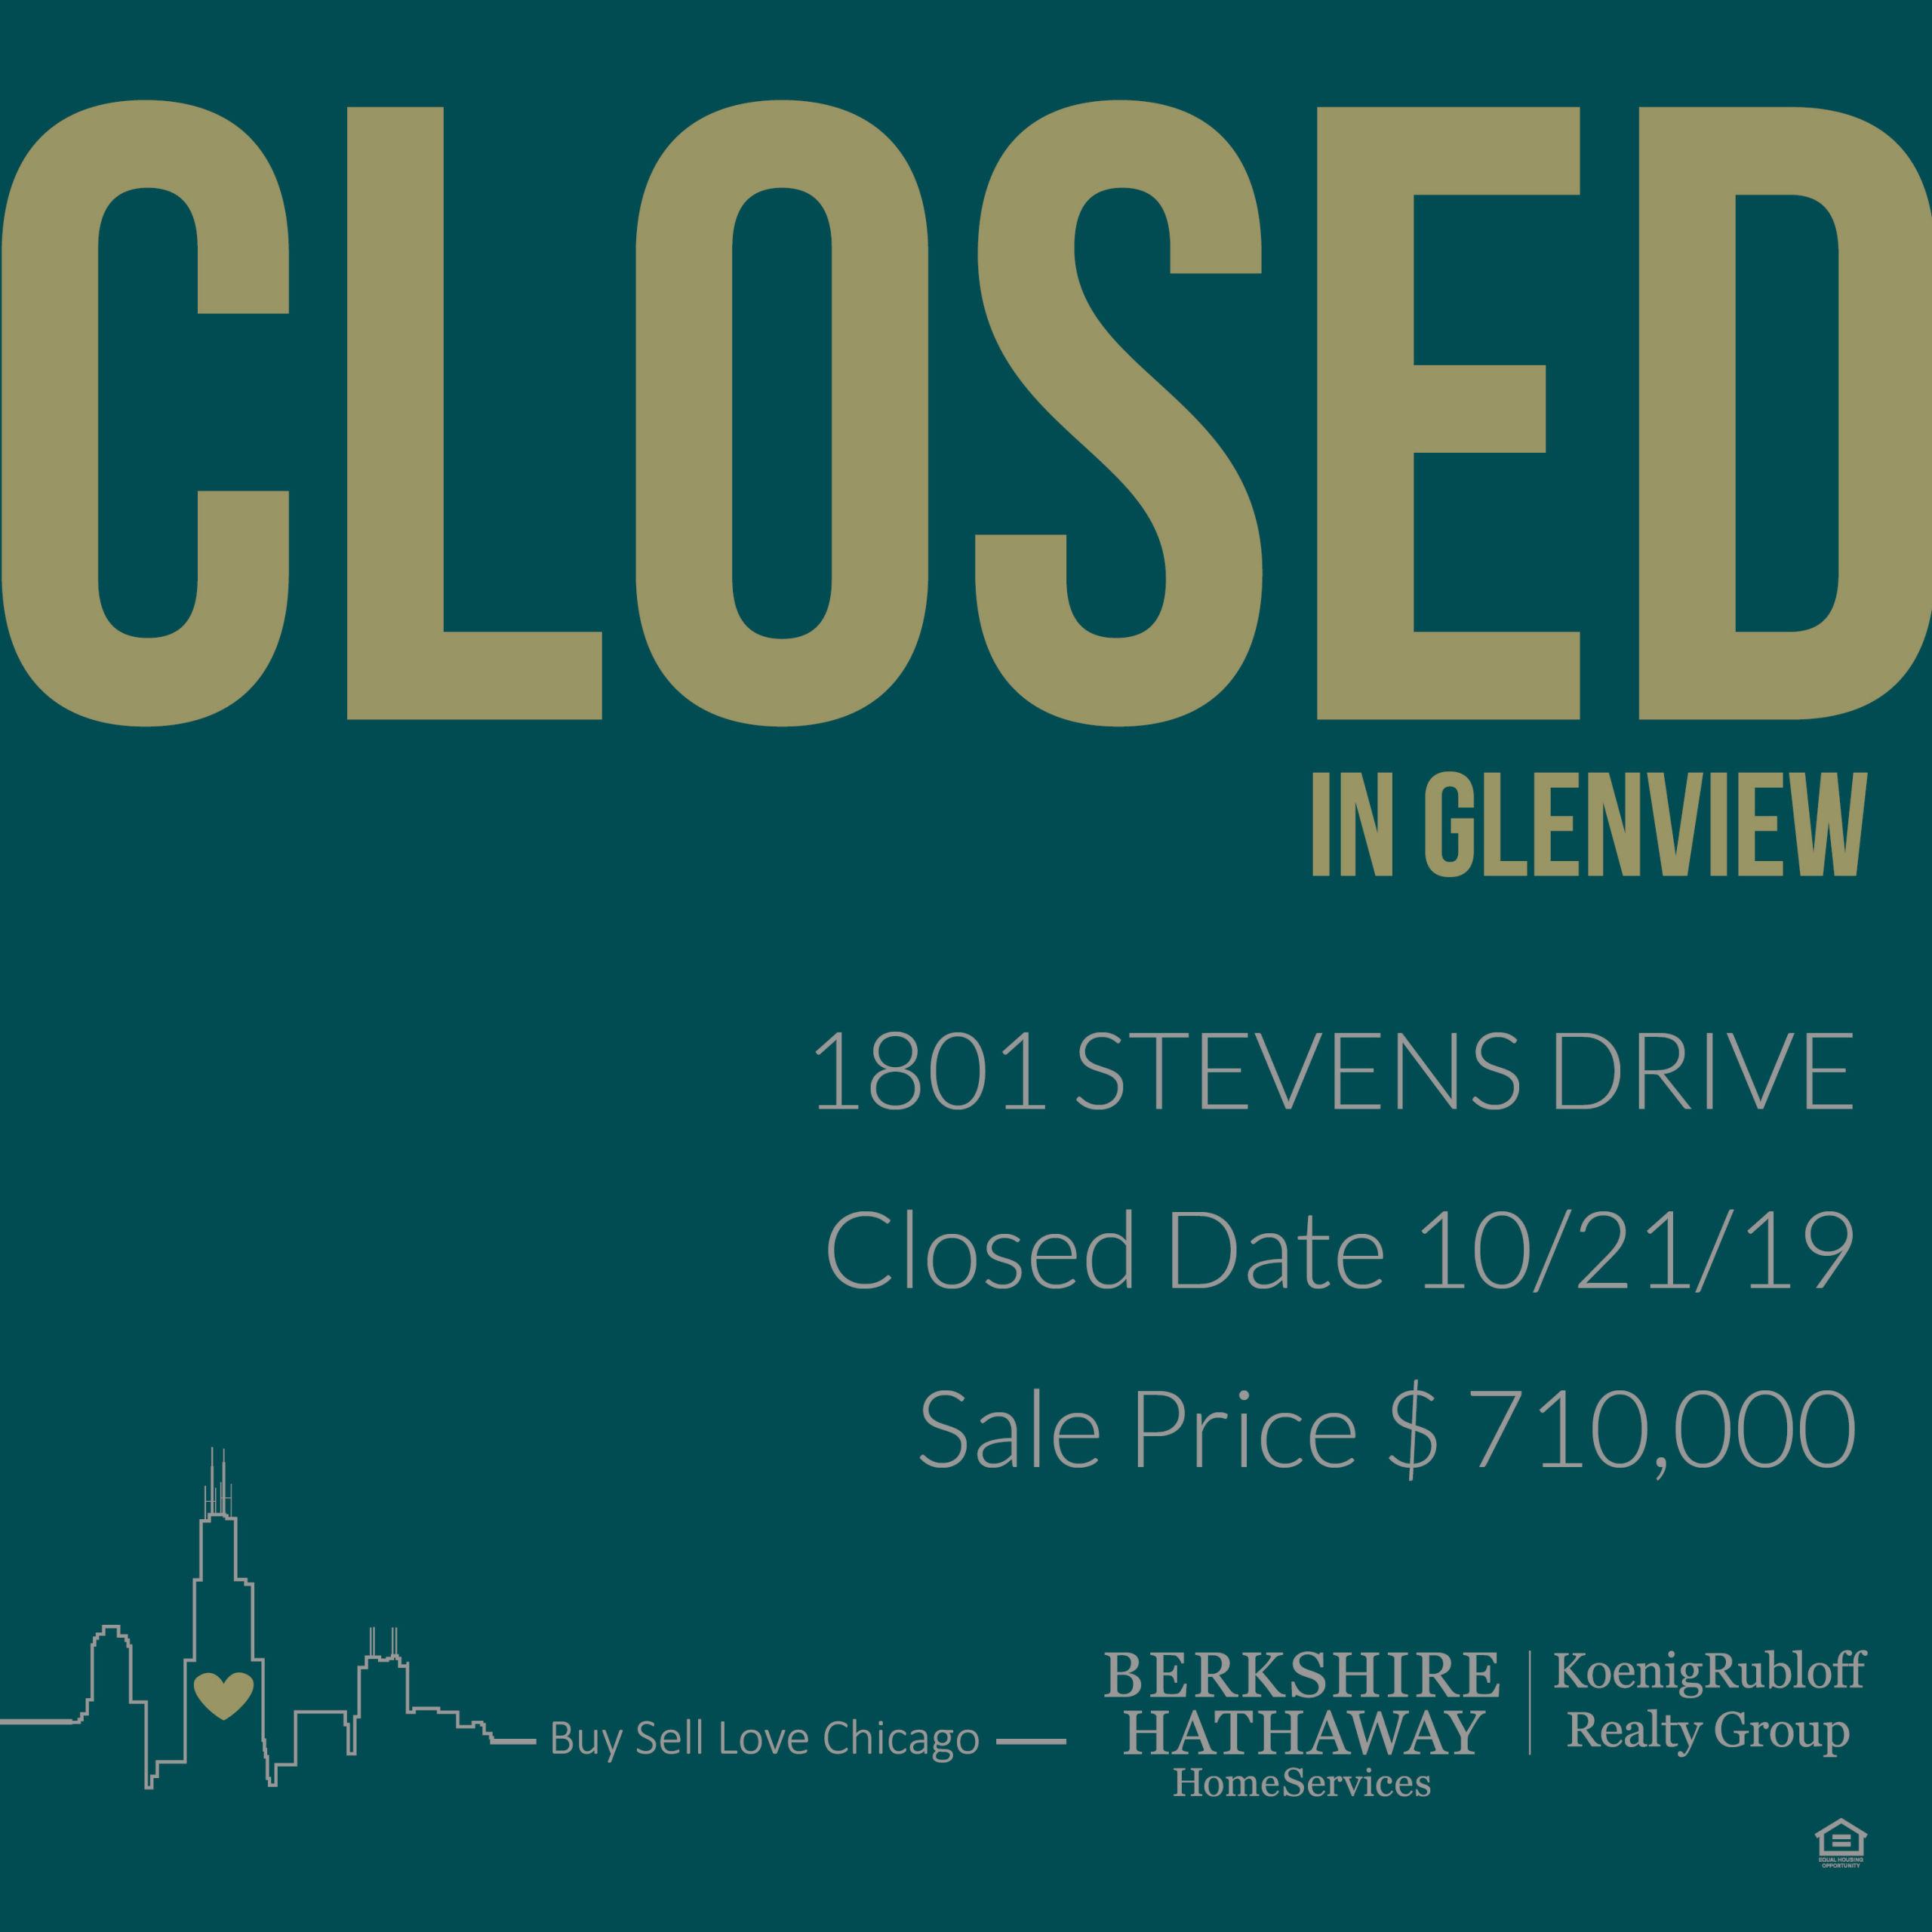 1801 Stevens Dr, Glenview, IL 60025